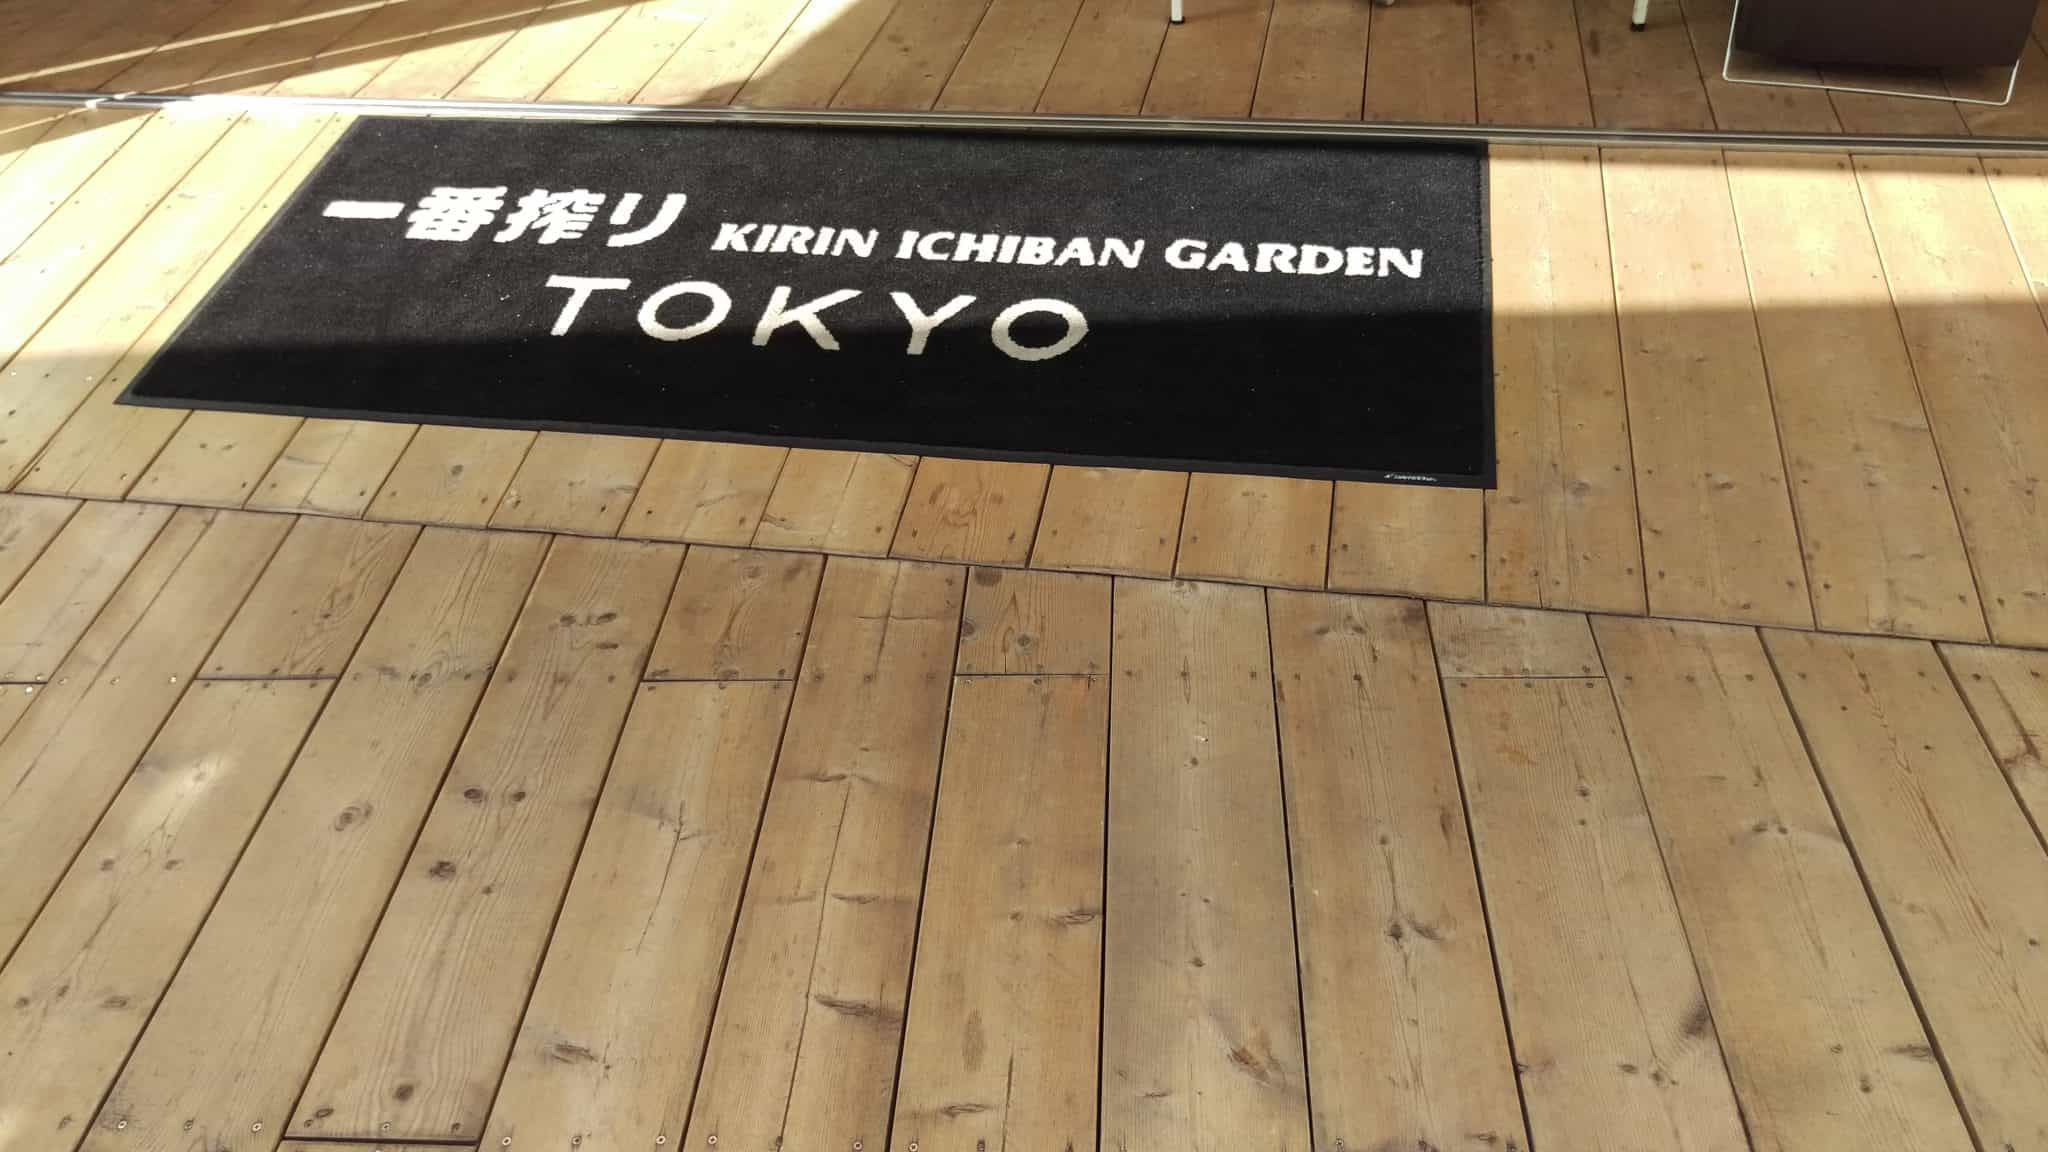 Kirin Beer Garden - A Summer Tradition - Japan - Kristen Abroad